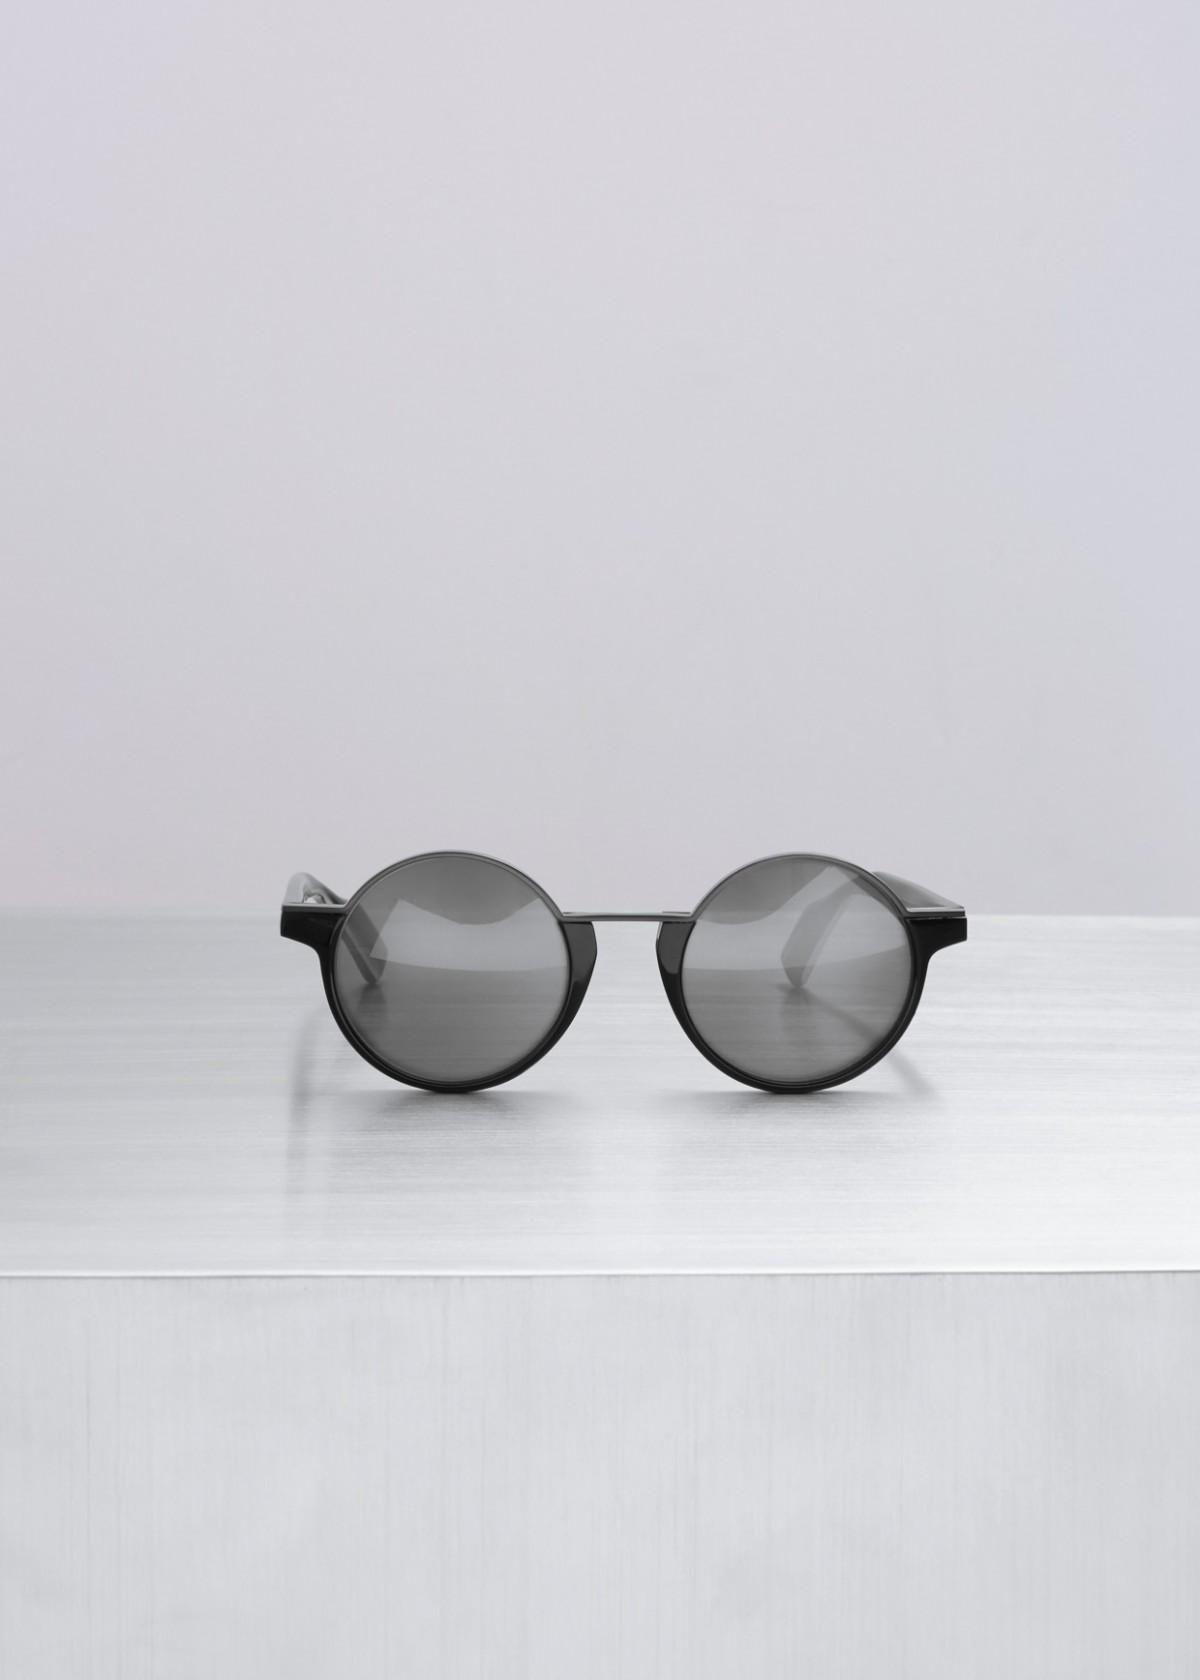 - HALF RIM ROUND SUNGLASSES / Yohji Yamamoto $550 available at Totokaelo